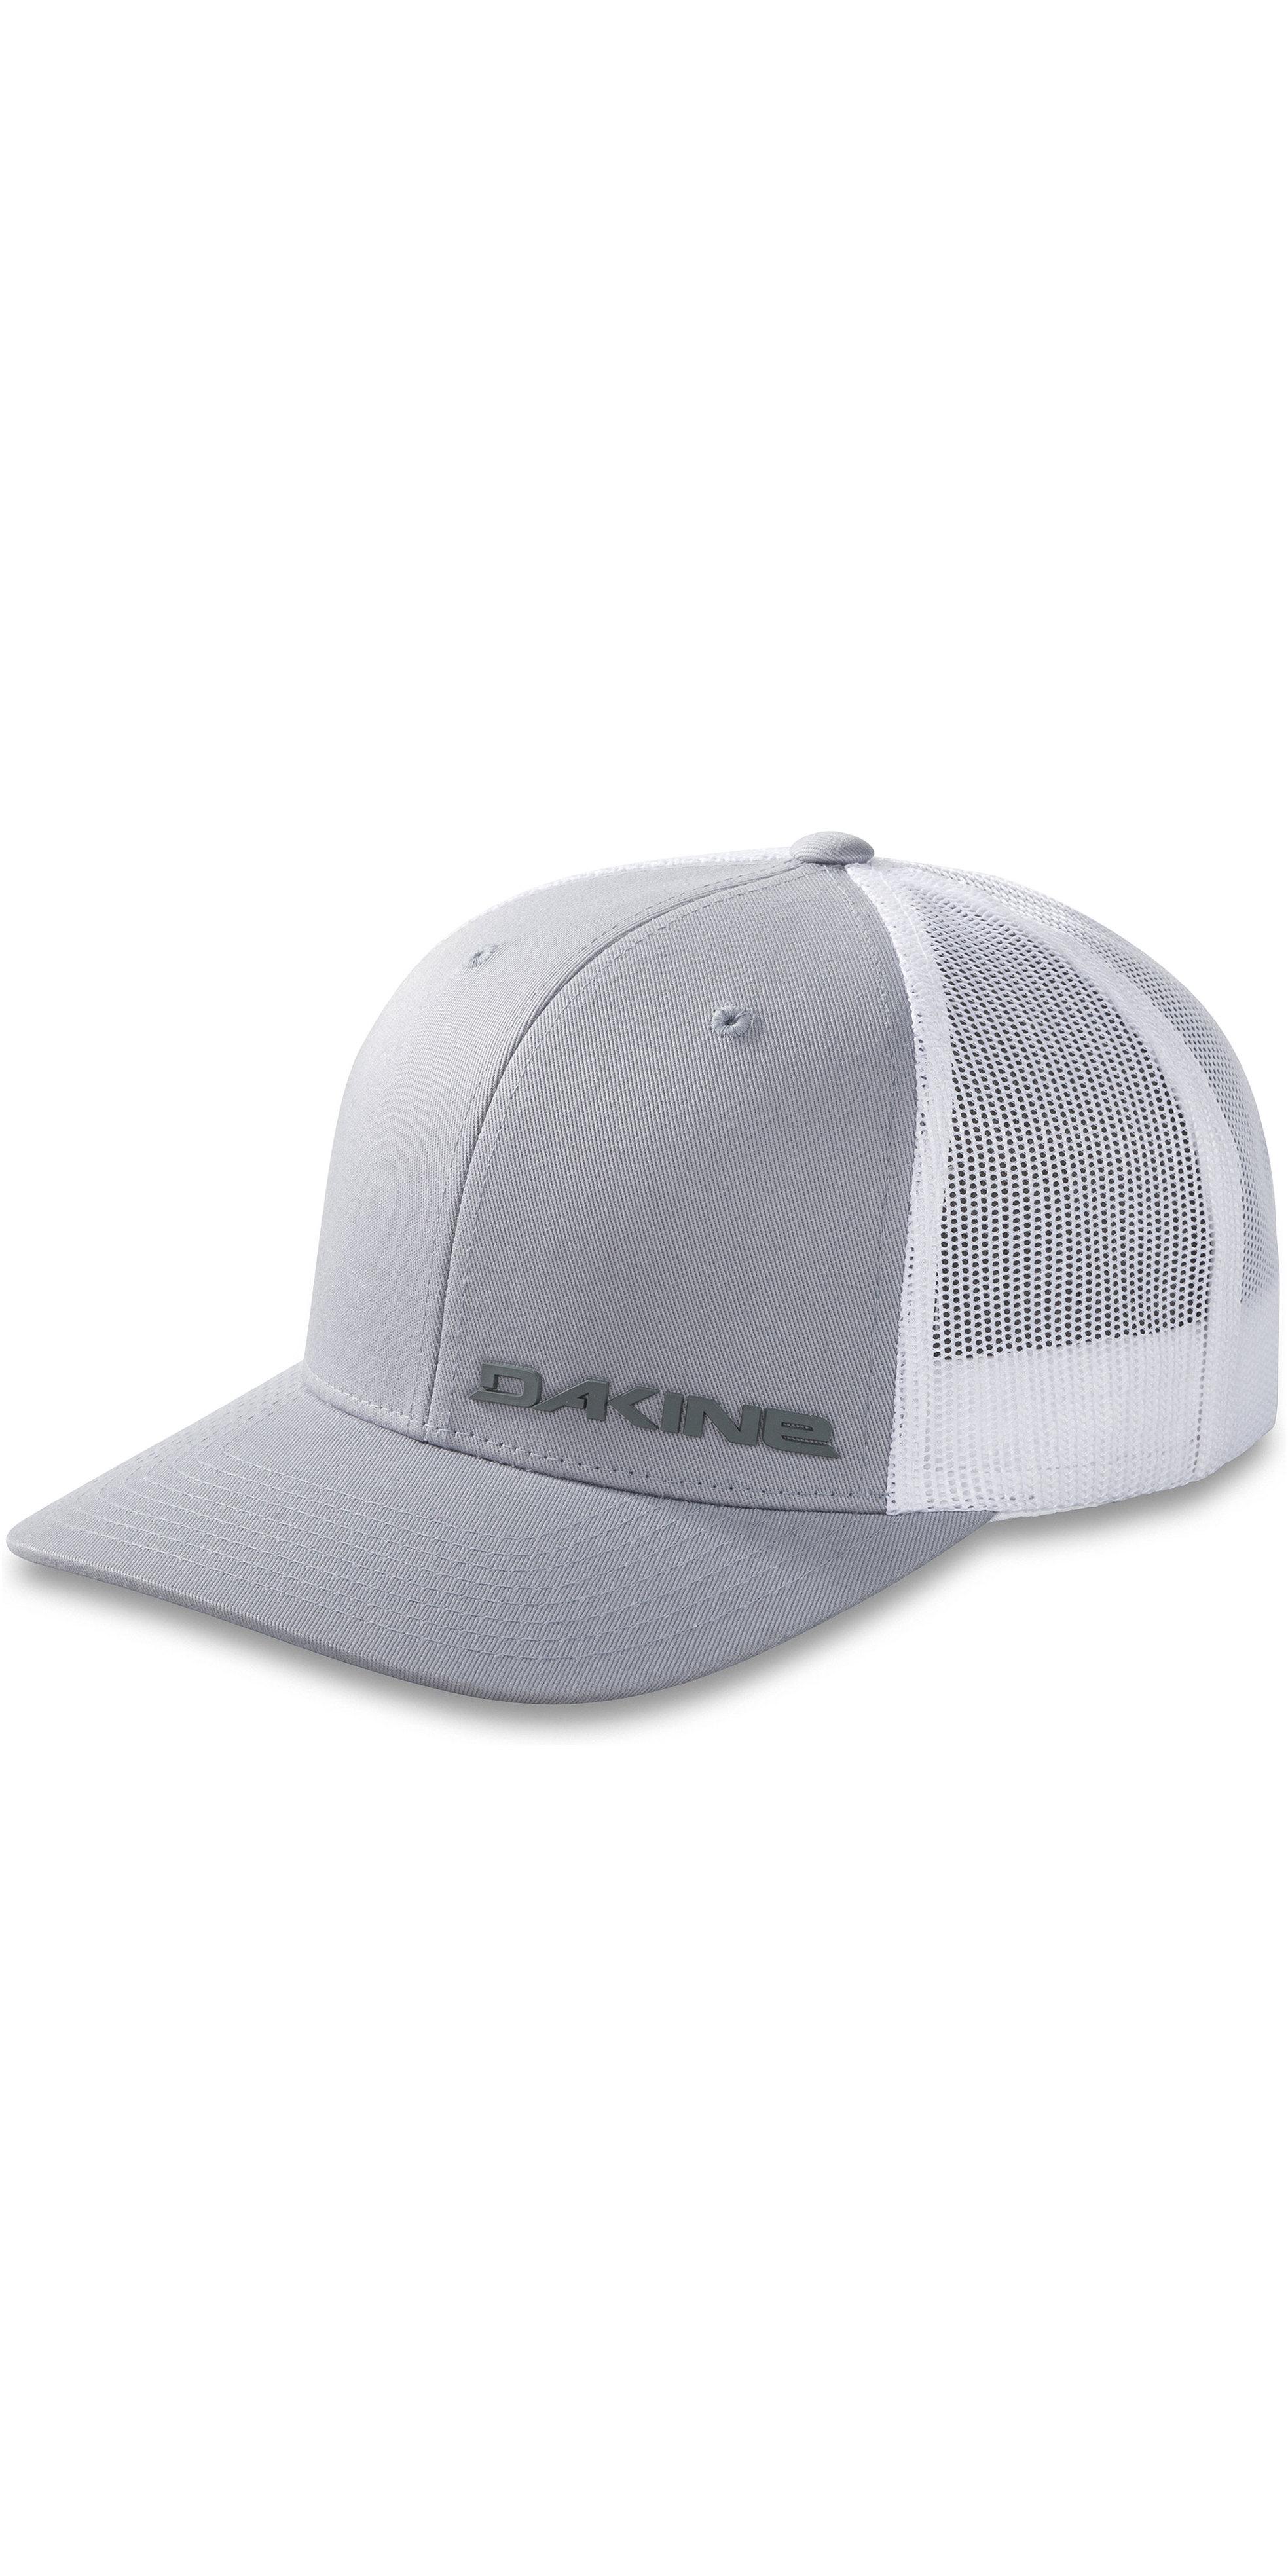 f6a62ec178217 2019 Dakine Rail Trucker Hat Grey 10002455 - Accessories - Mens - Clothing  - by Dakine | Wetsuit Outlet